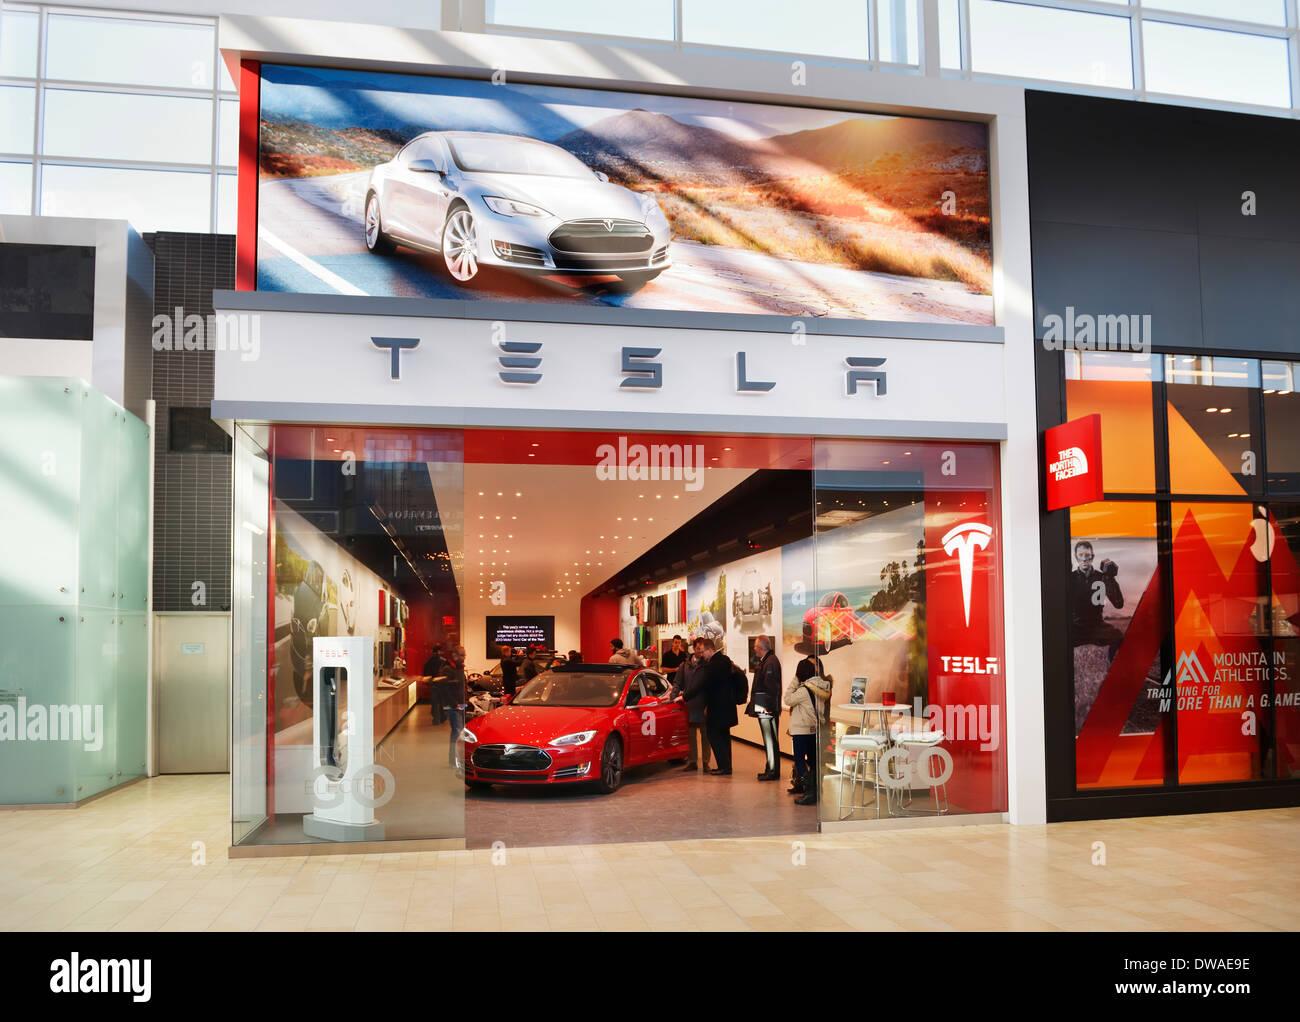 Tesla Motors store display at Yorkdale Shopping Centre, Toronto, Ontario, Canada 2014 - Stock Image